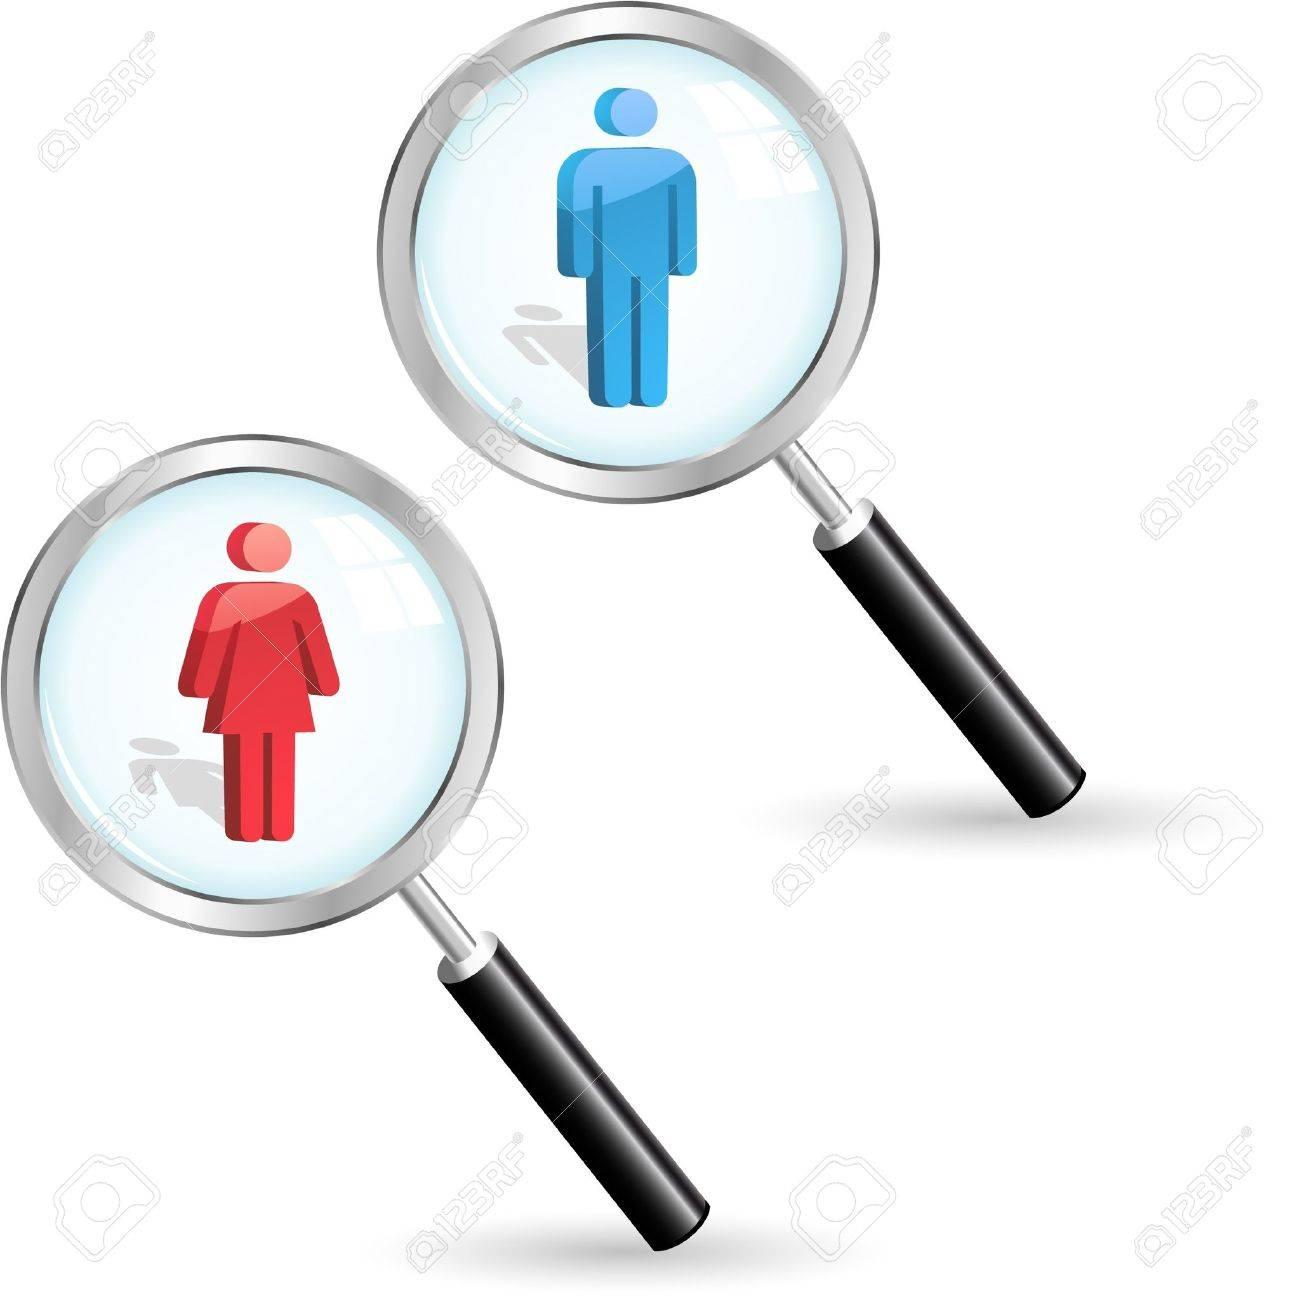 Men and women icon set. Stock Vector - 9401612